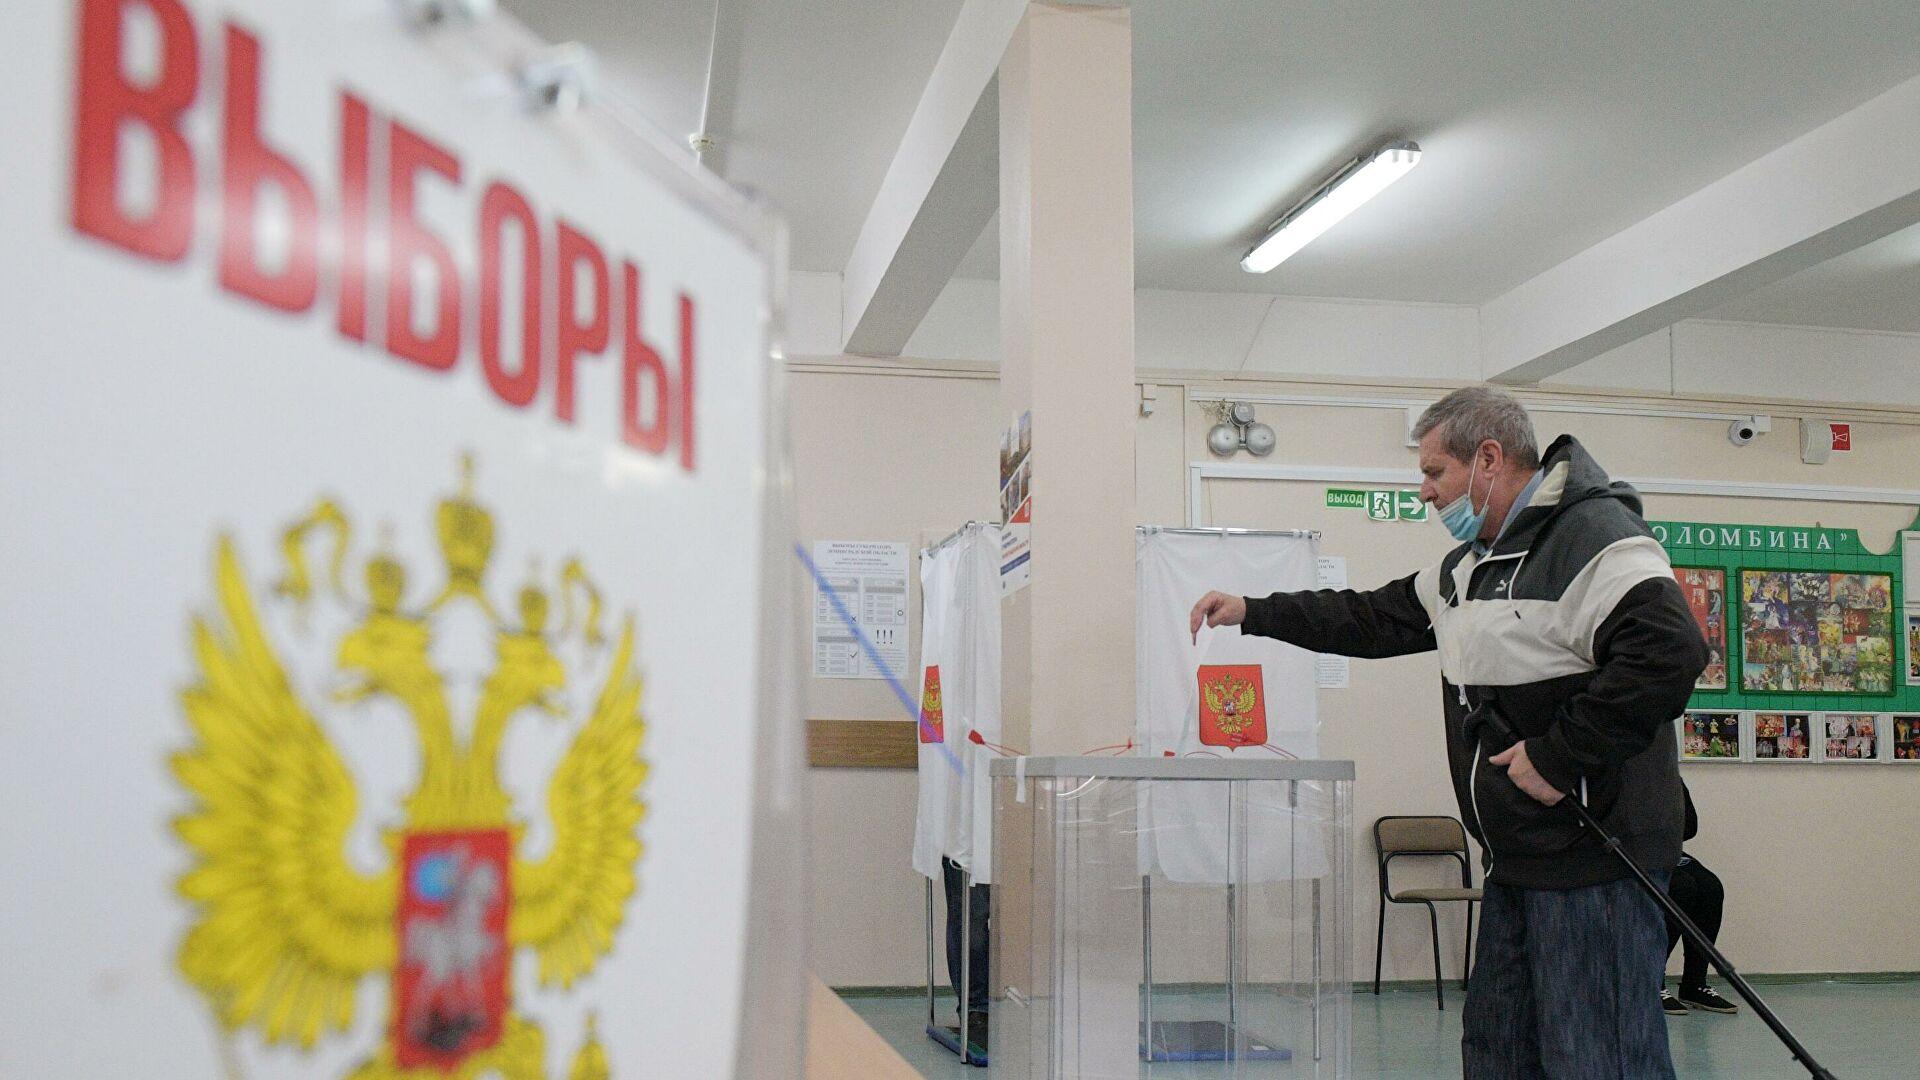 Мэр Якутска: Соблюдайте все требования безопасности от коронавируса на выборах